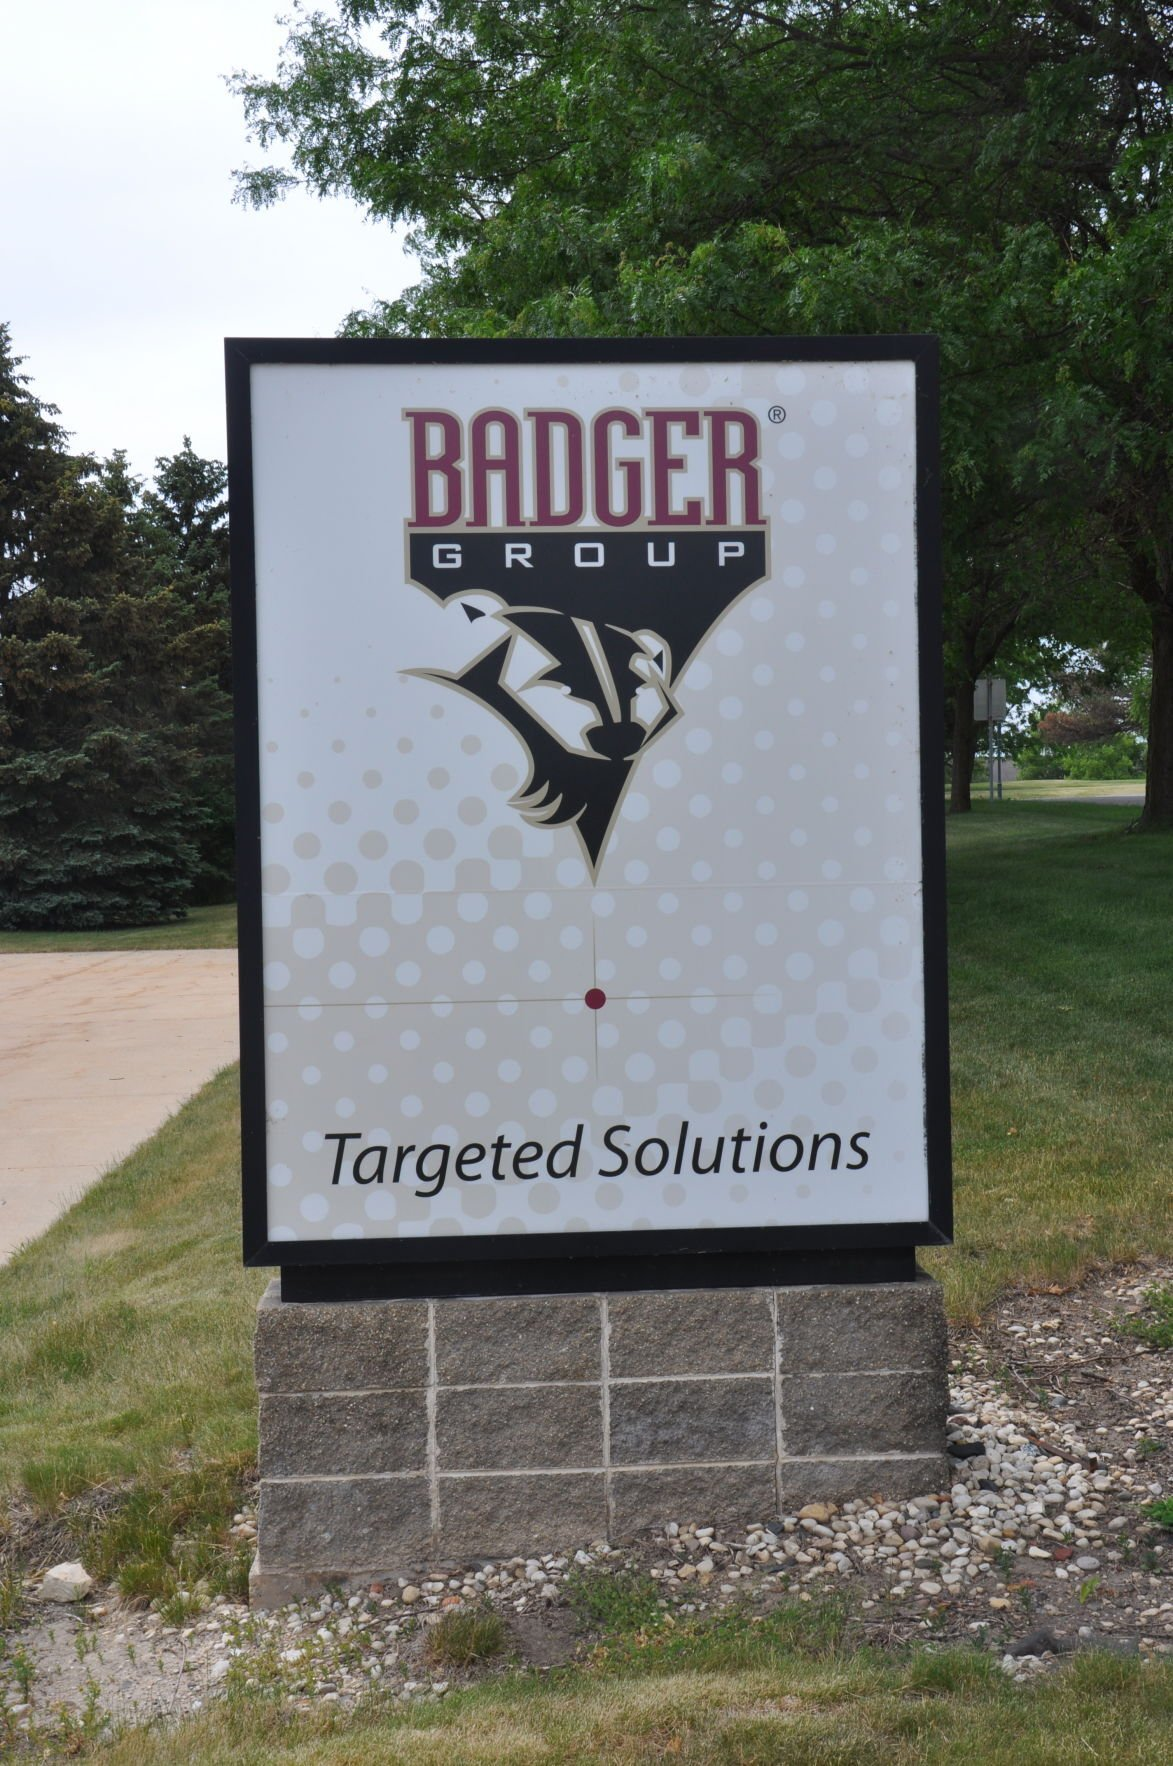 Badger Group 2